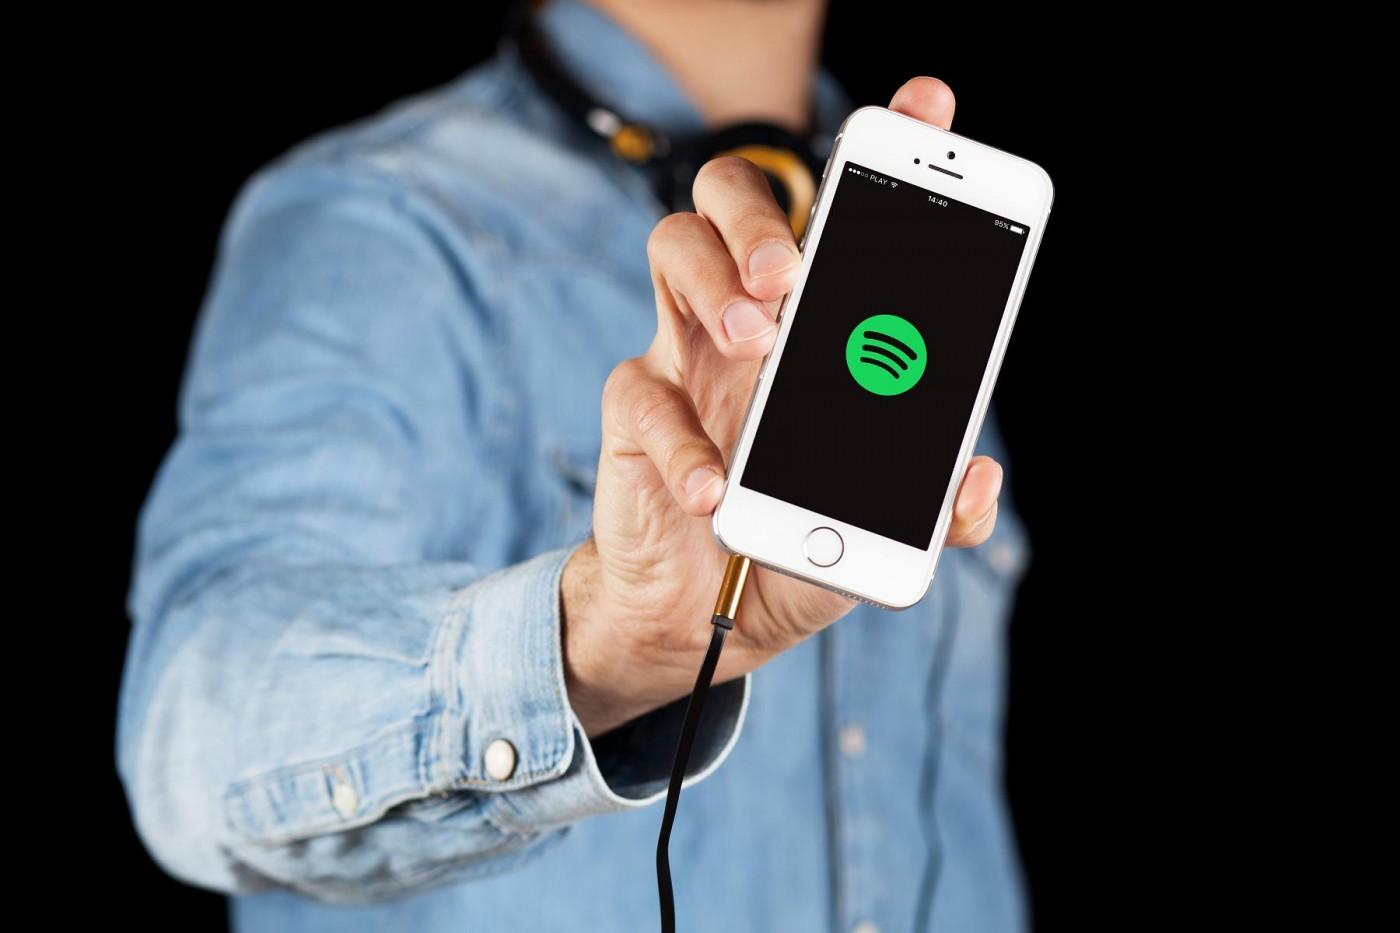 Spotify槓上蘋果一年後,再提免徵「蘋果稅」訴求、不滿App Store抽成高達30%